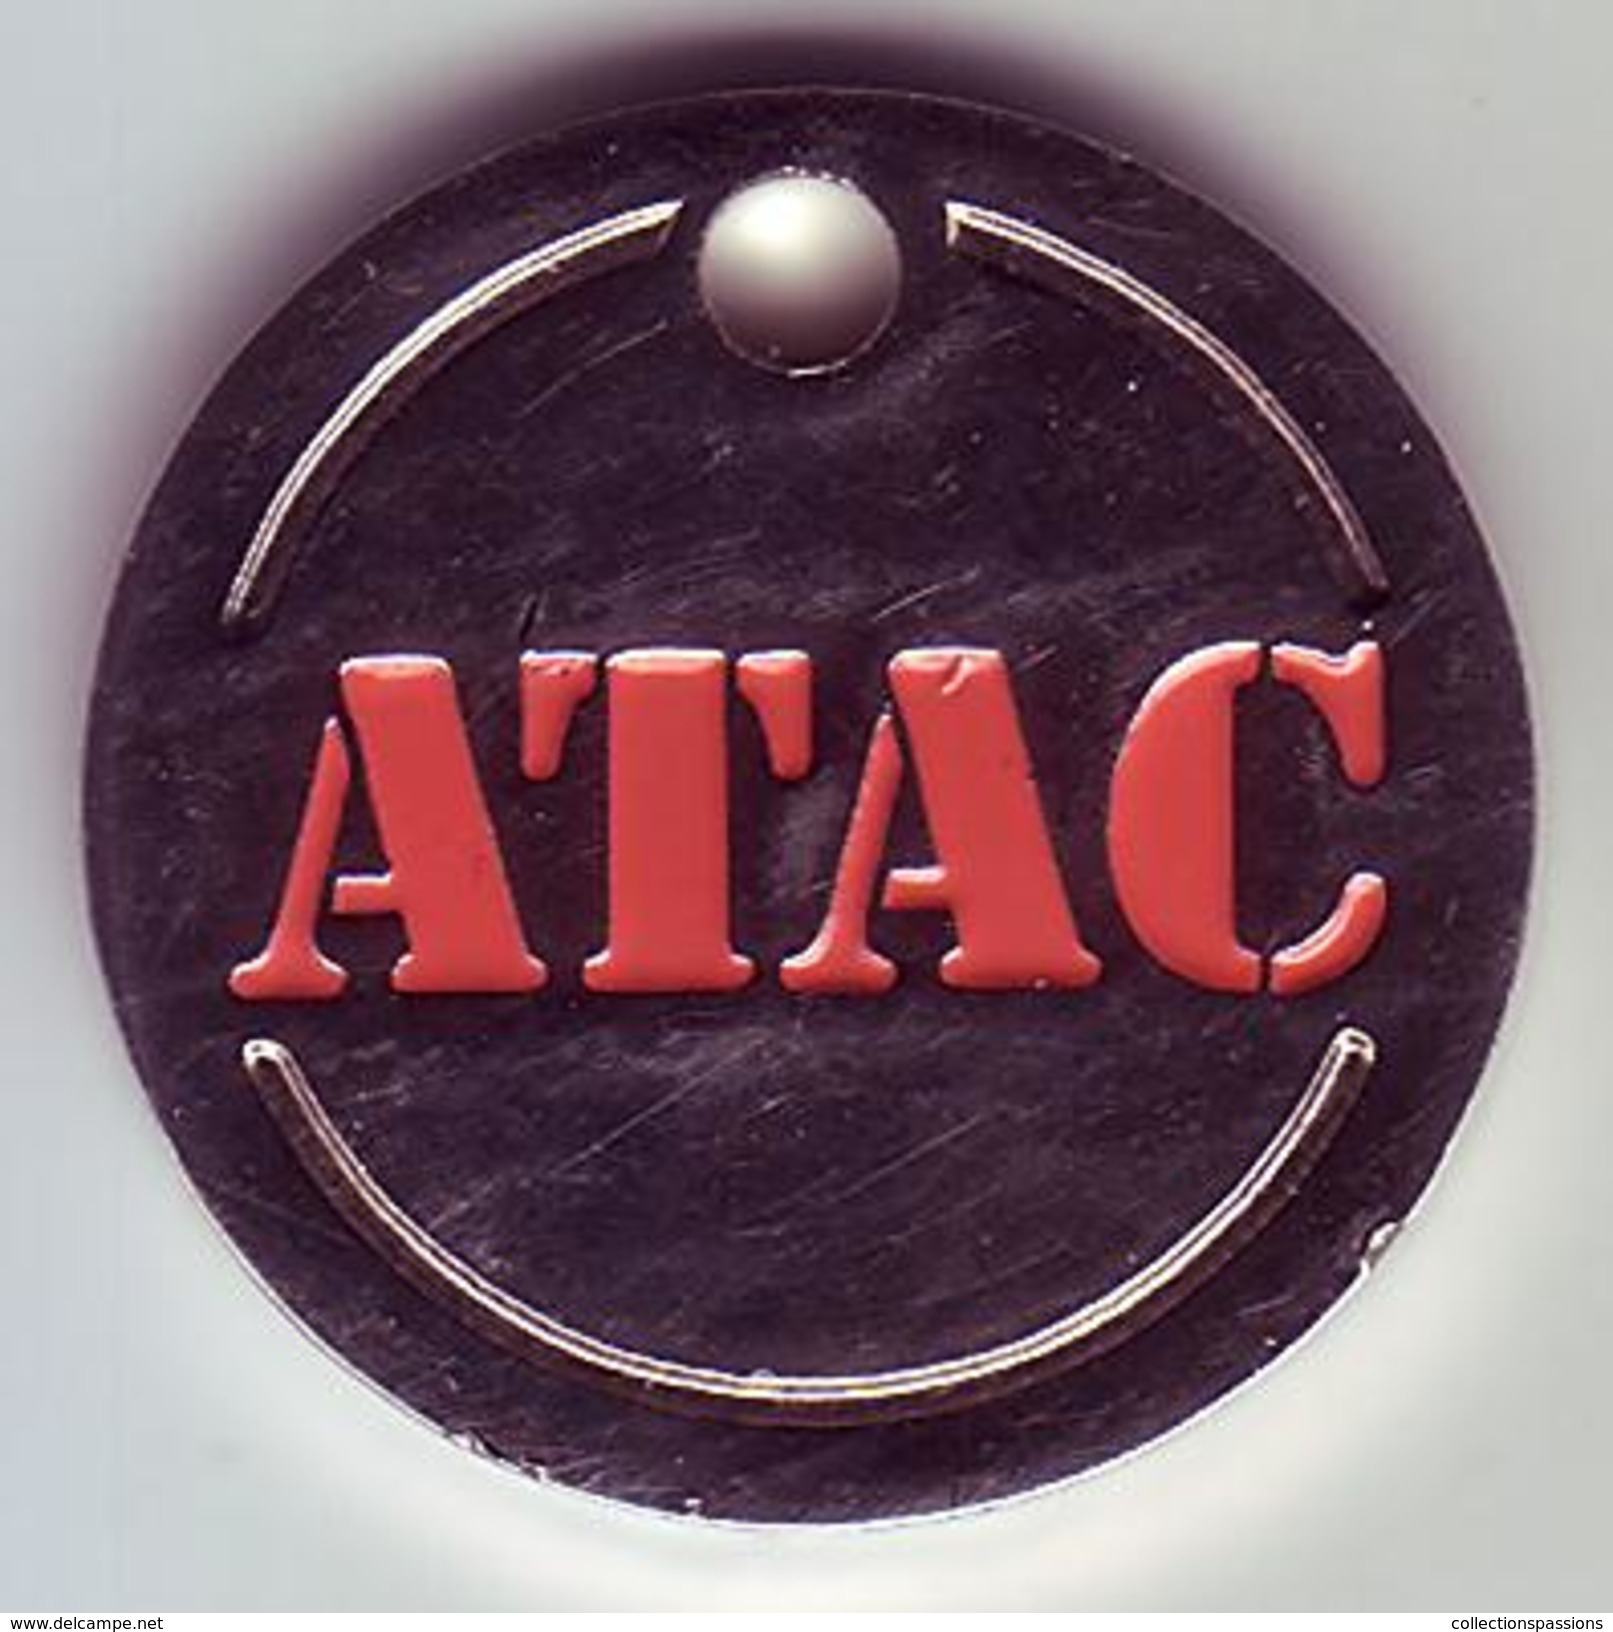 - Jeton - ATAC - - Jetons De Caddies